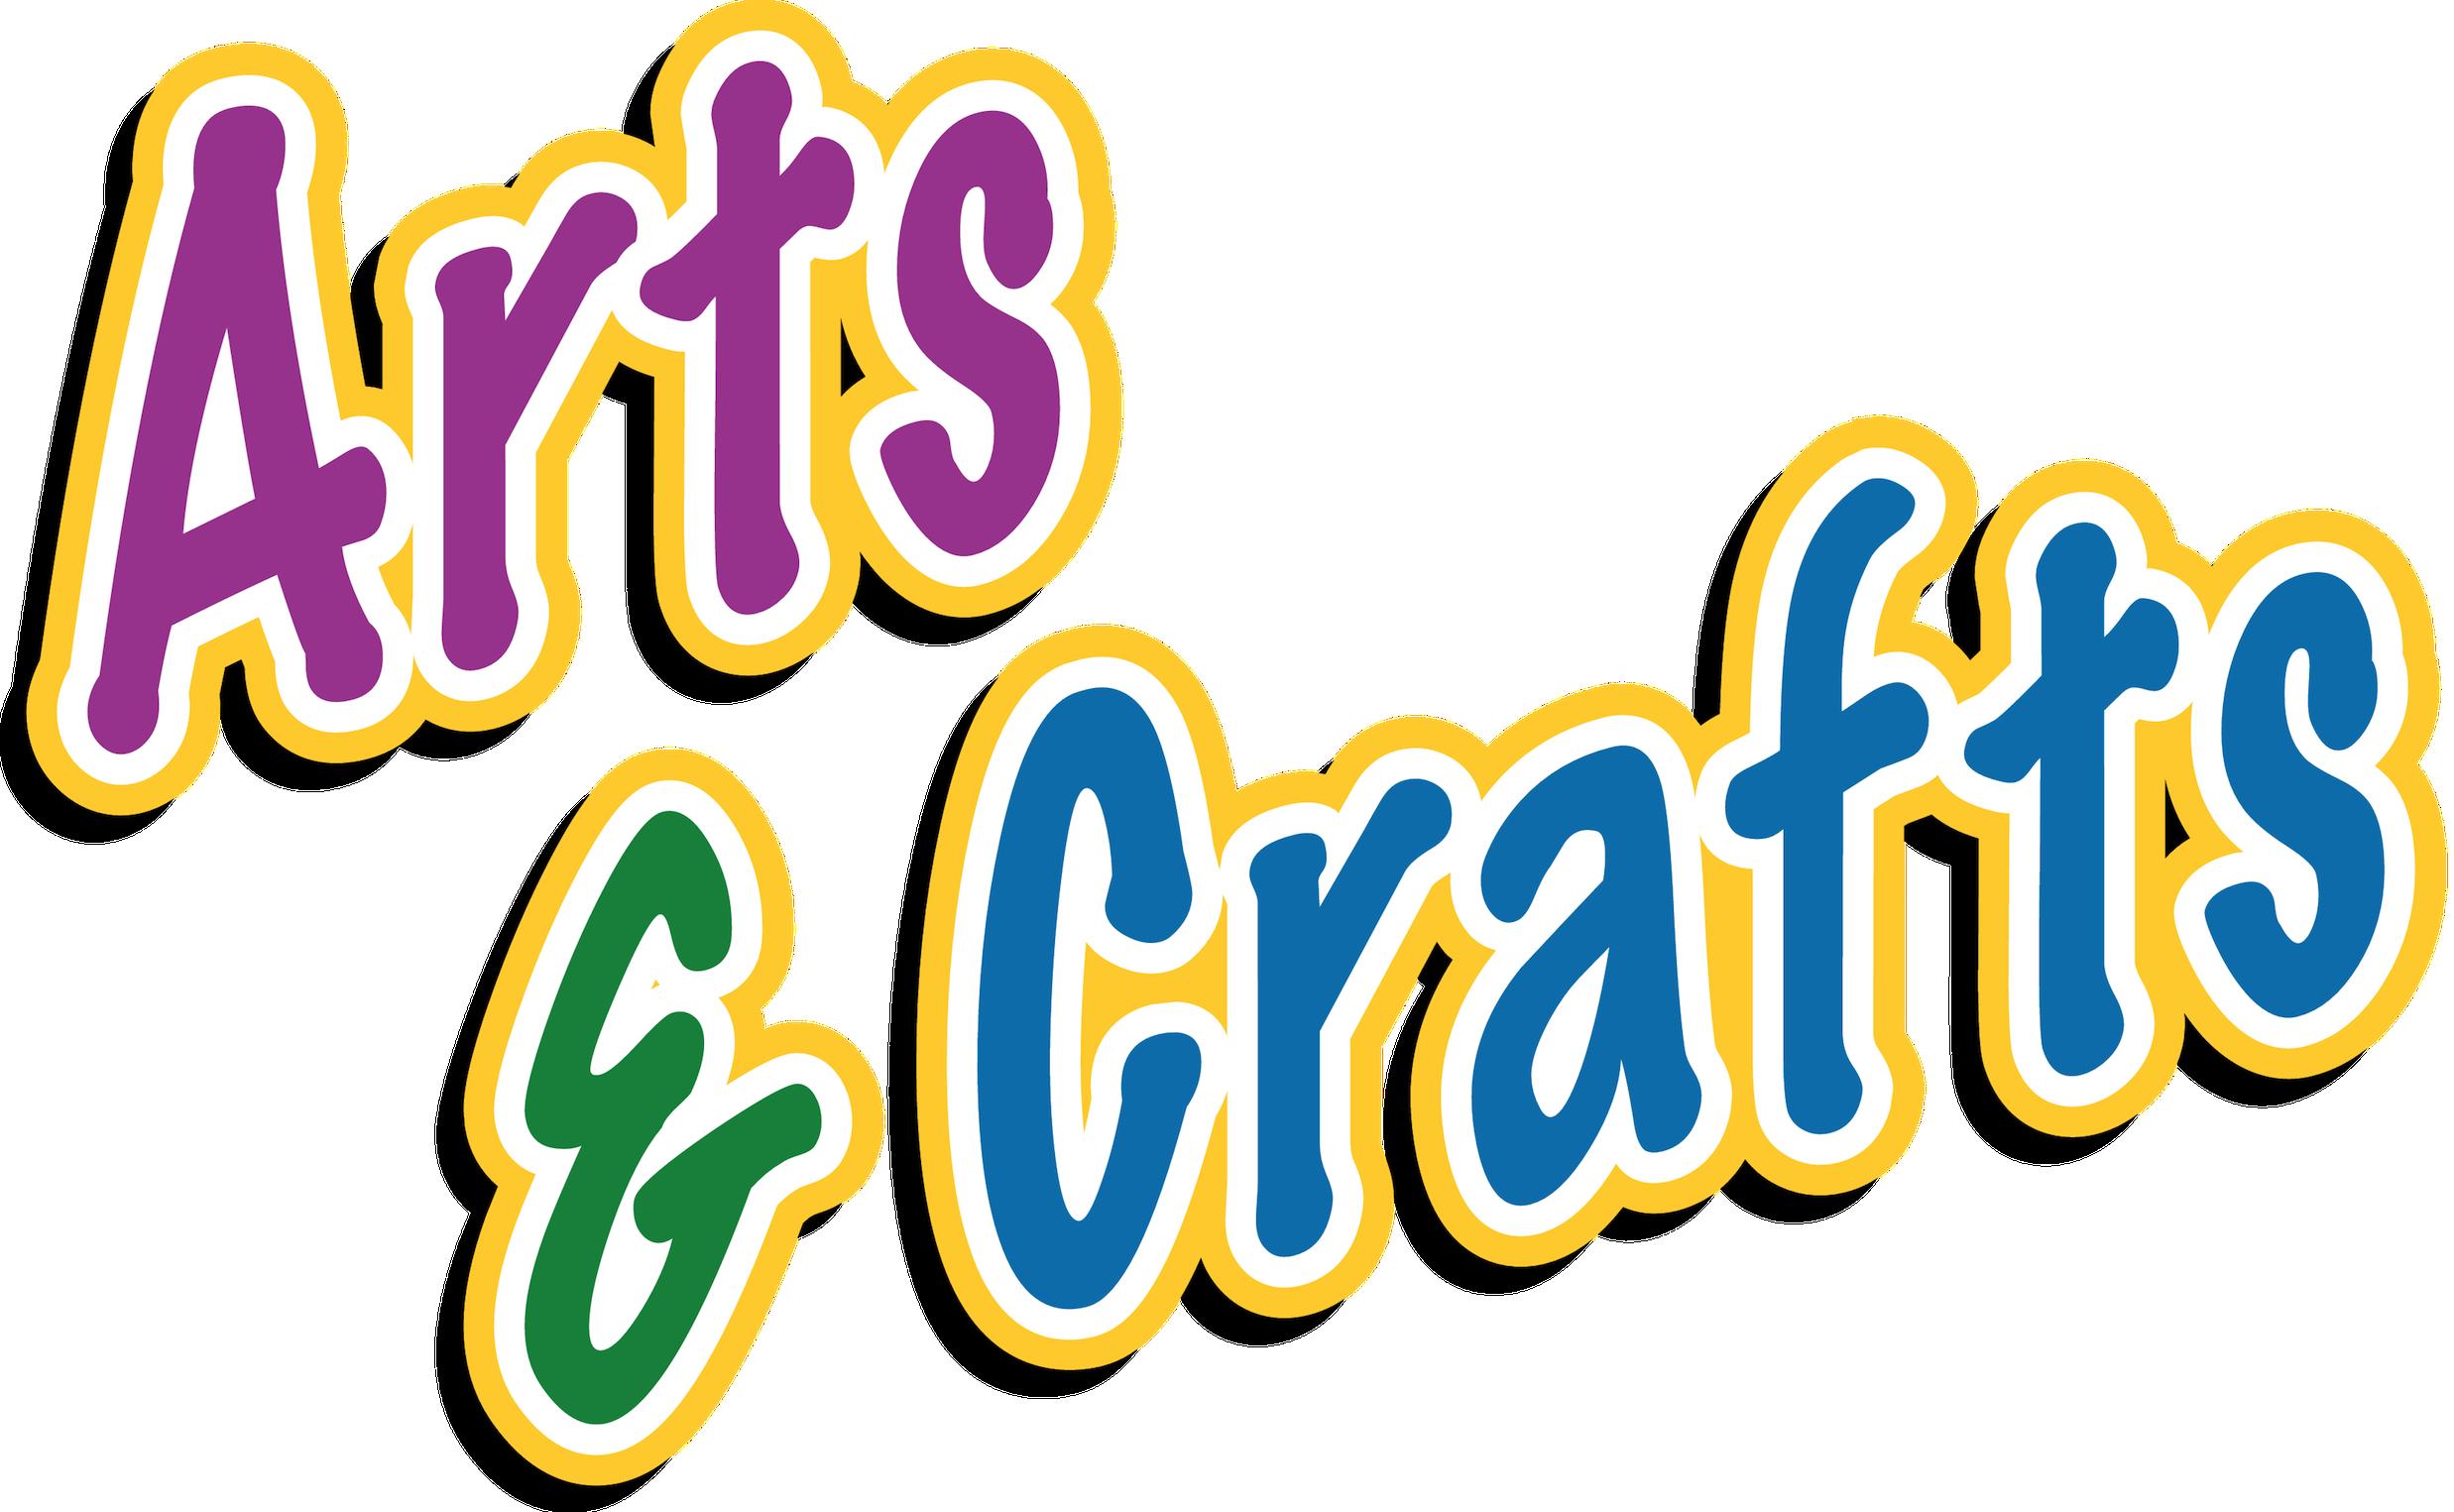 Church clipart craft fair Simply Collection retro 2012 Craft